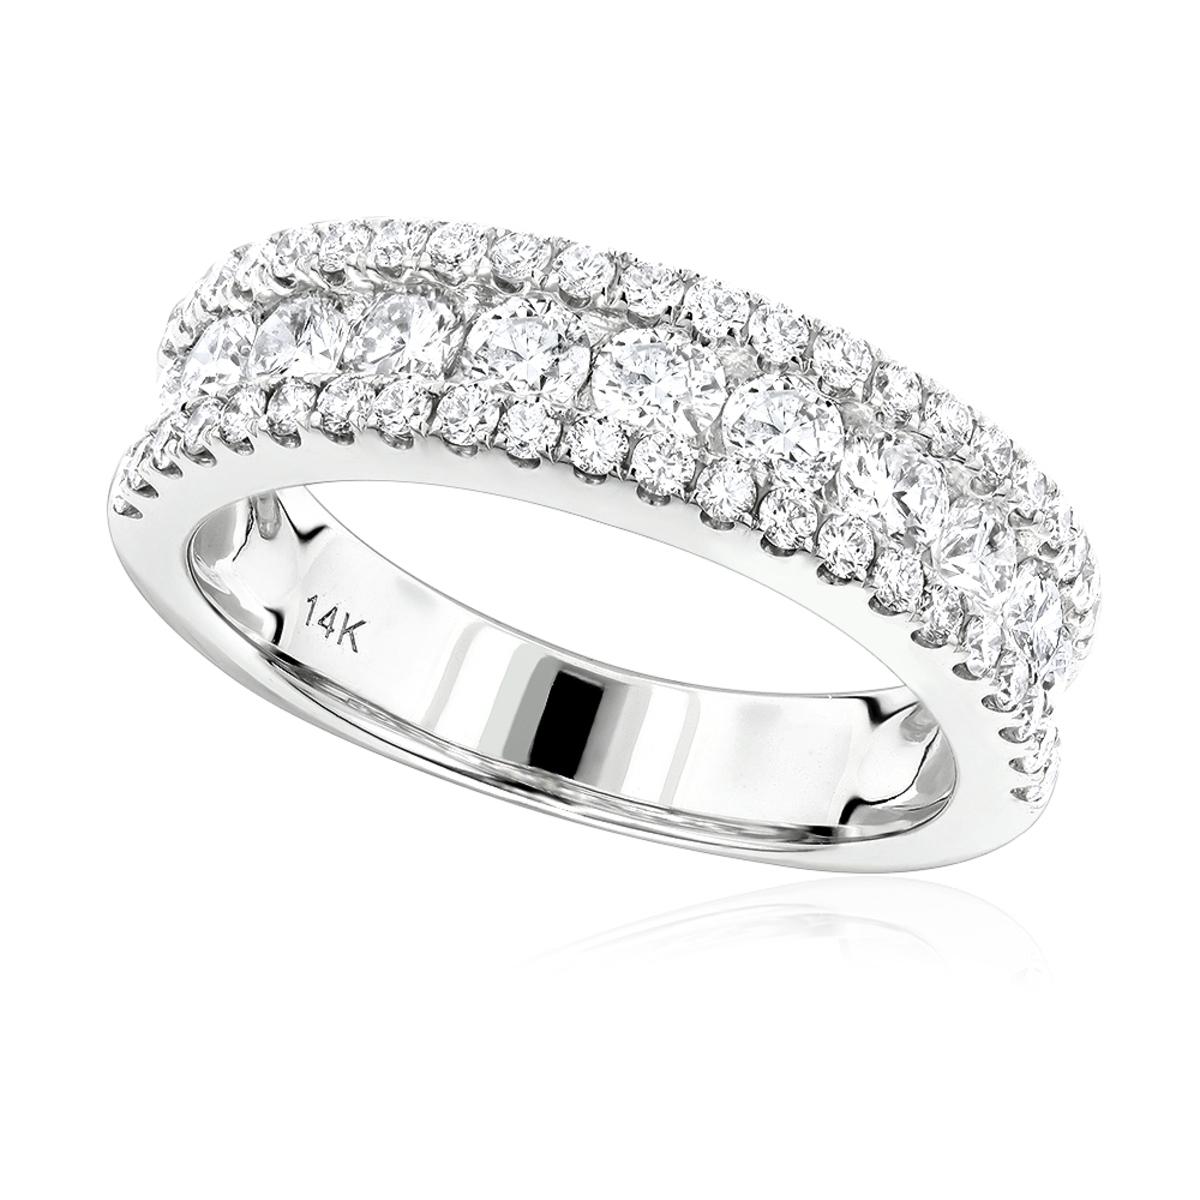 Luxurman Ladies Rings: 14K Gold Round Diamond Wedding Band for ...